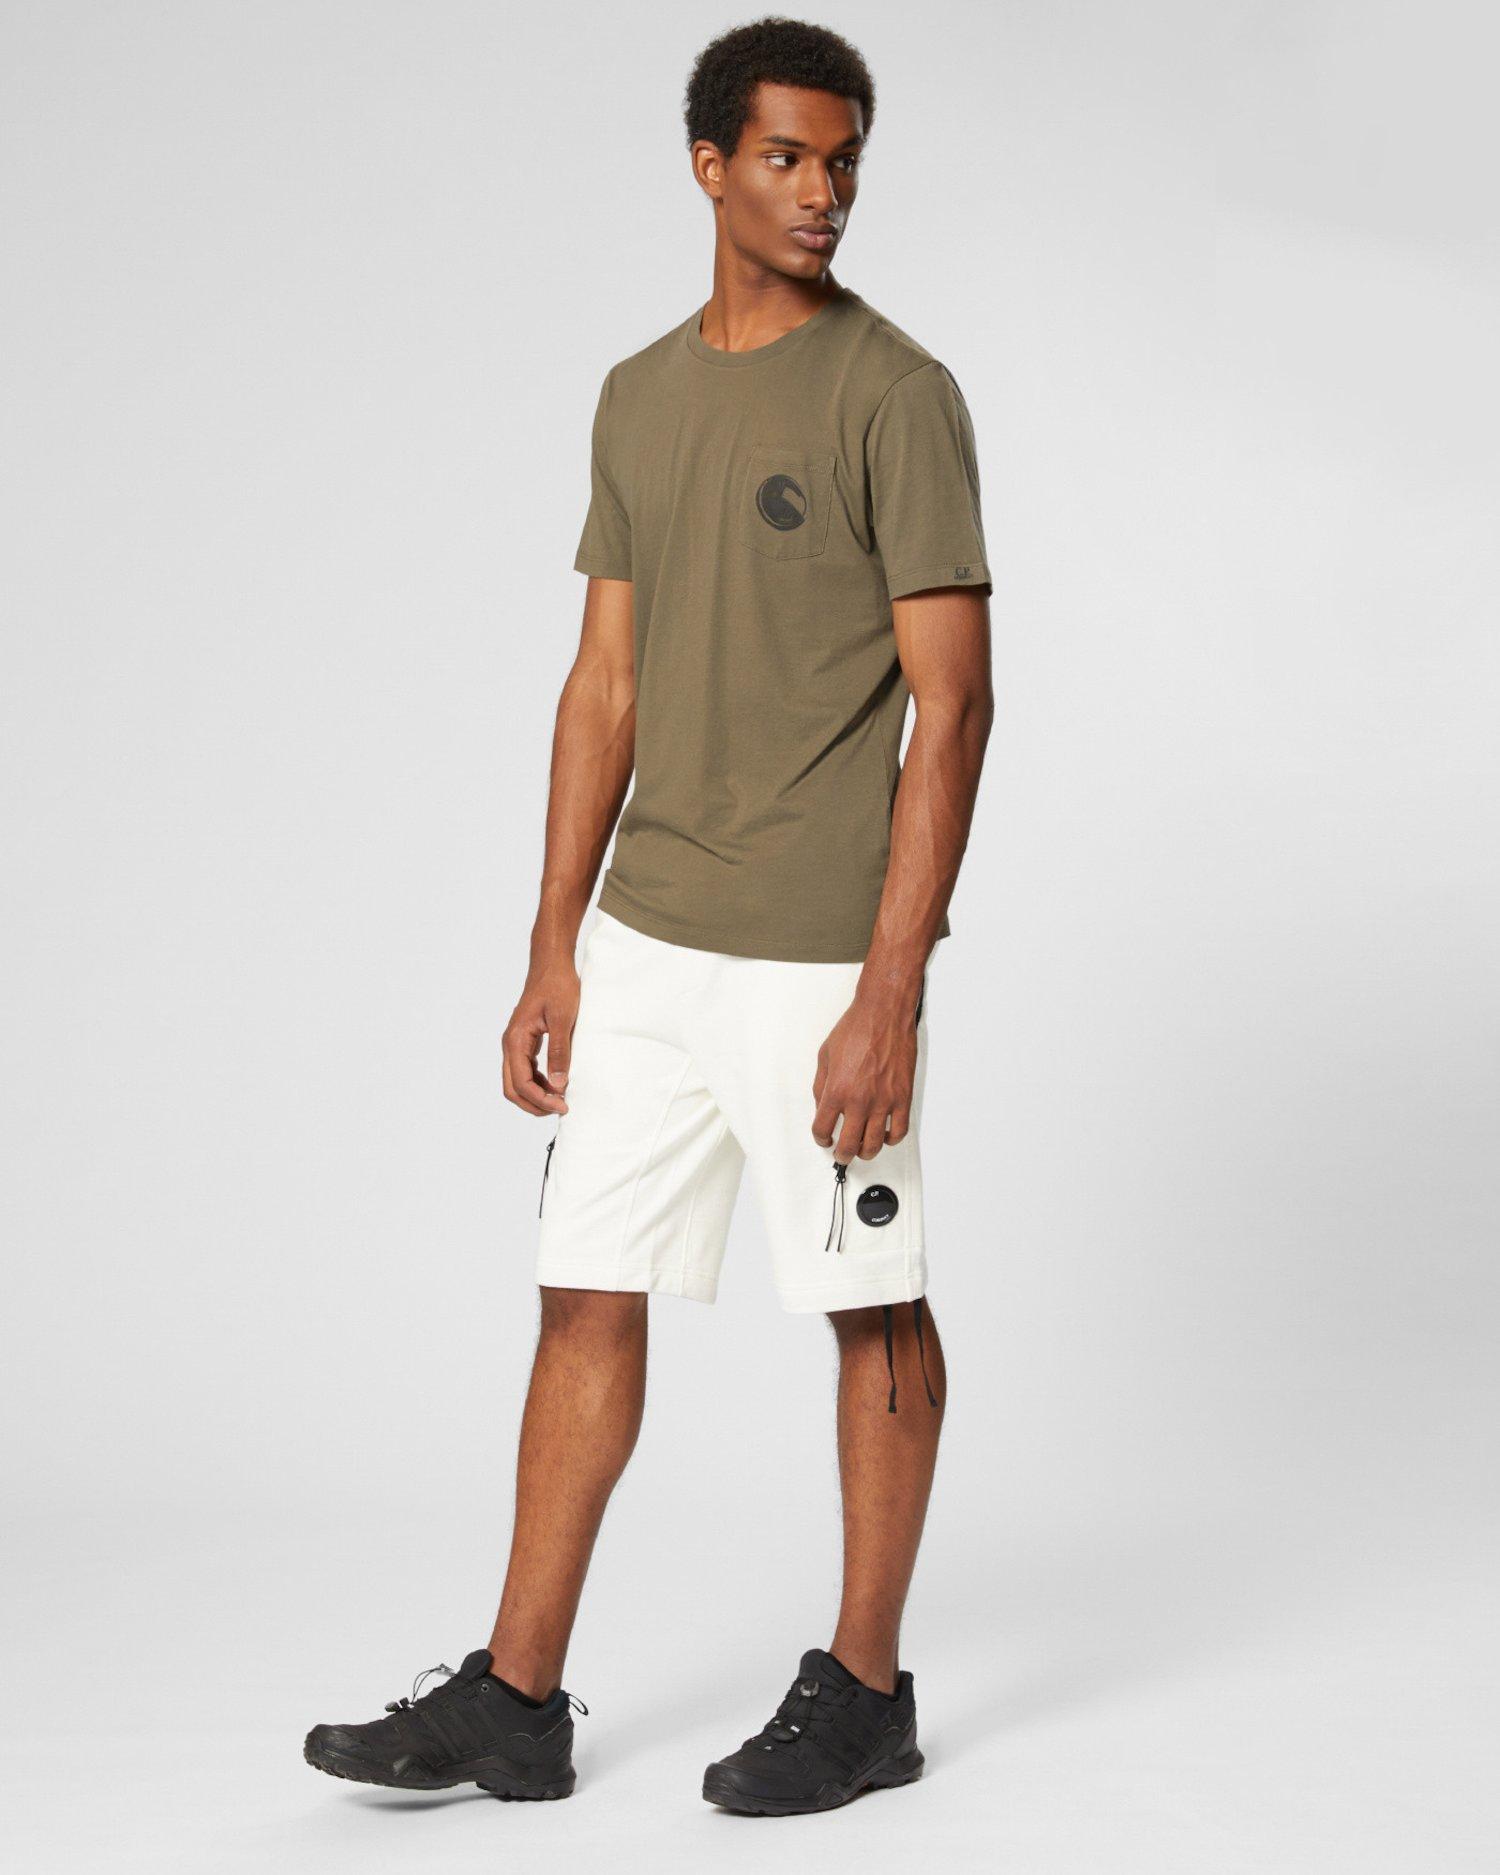 Jersey 30/1 Lens Pocket Print T-Shirt